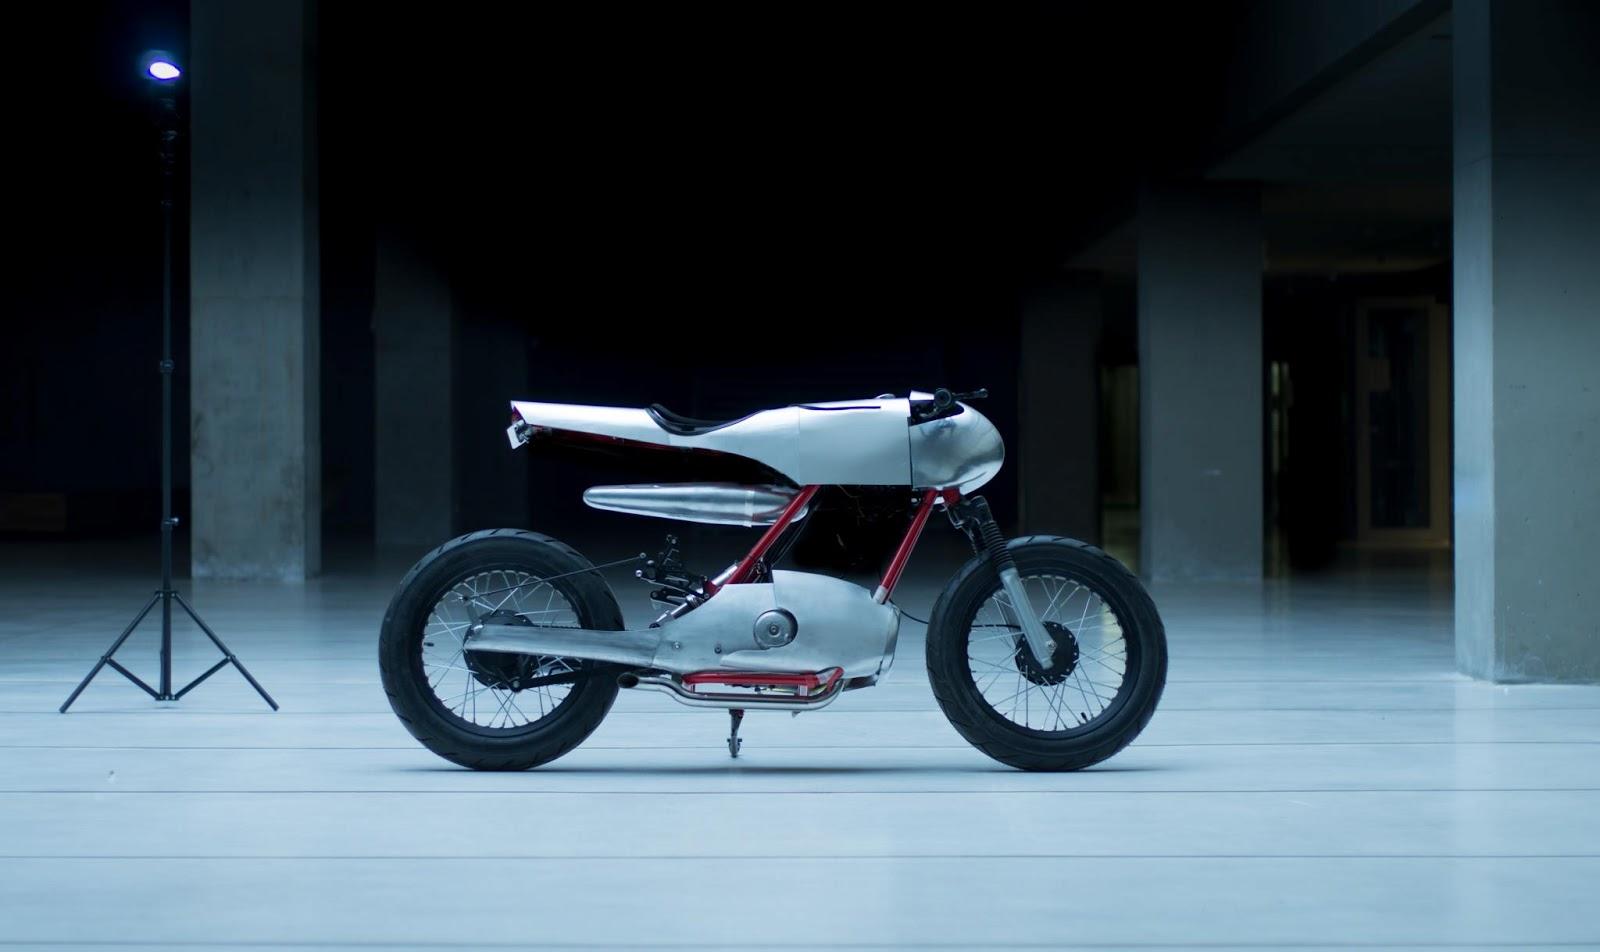 iM Cubaholic Ep.7: Honda Super Cub Roadrunner